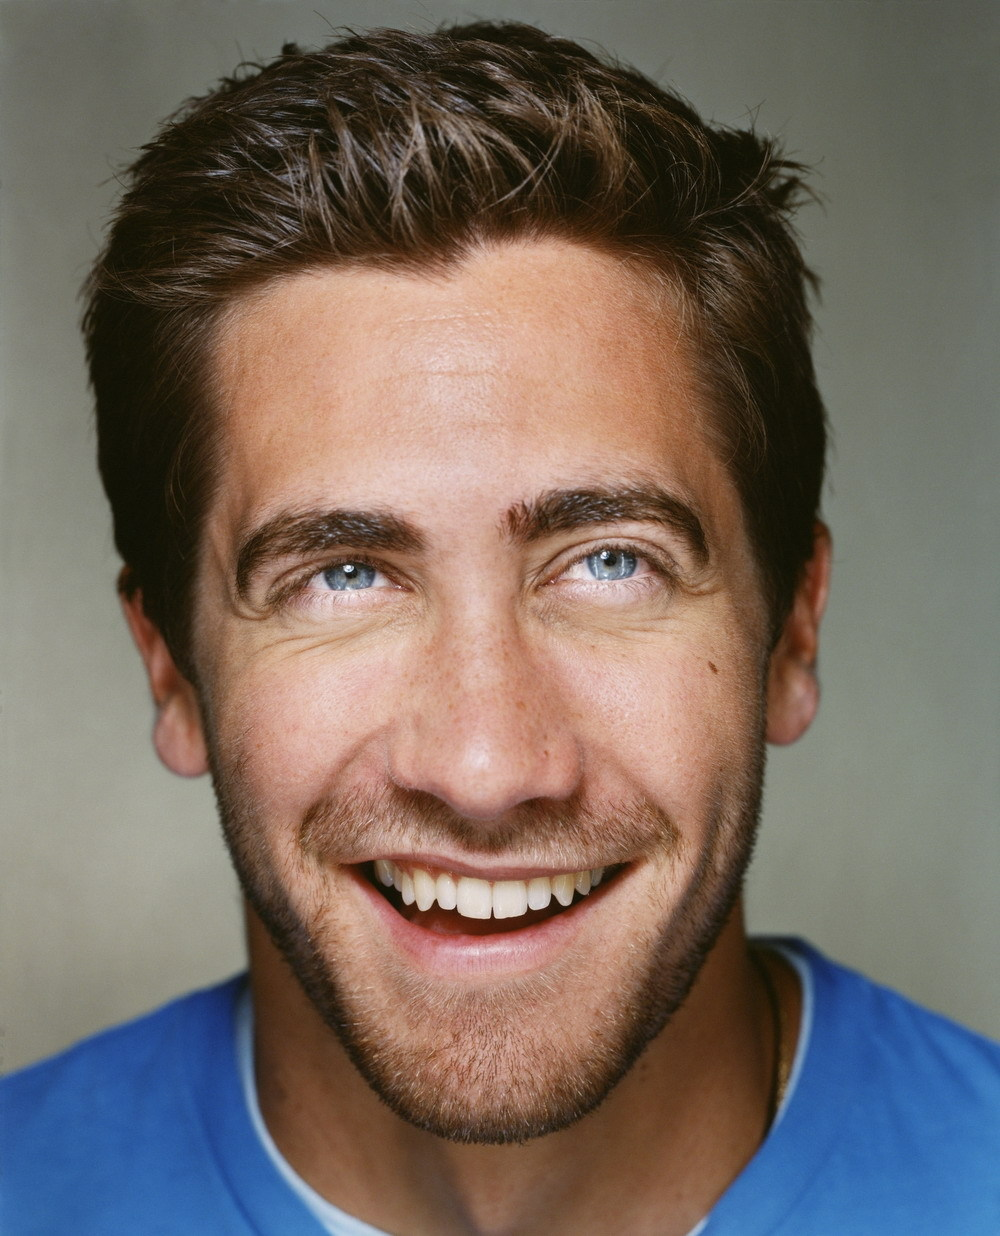 Jake Gyllenhaal - Jake... Jake Gyllenhaal